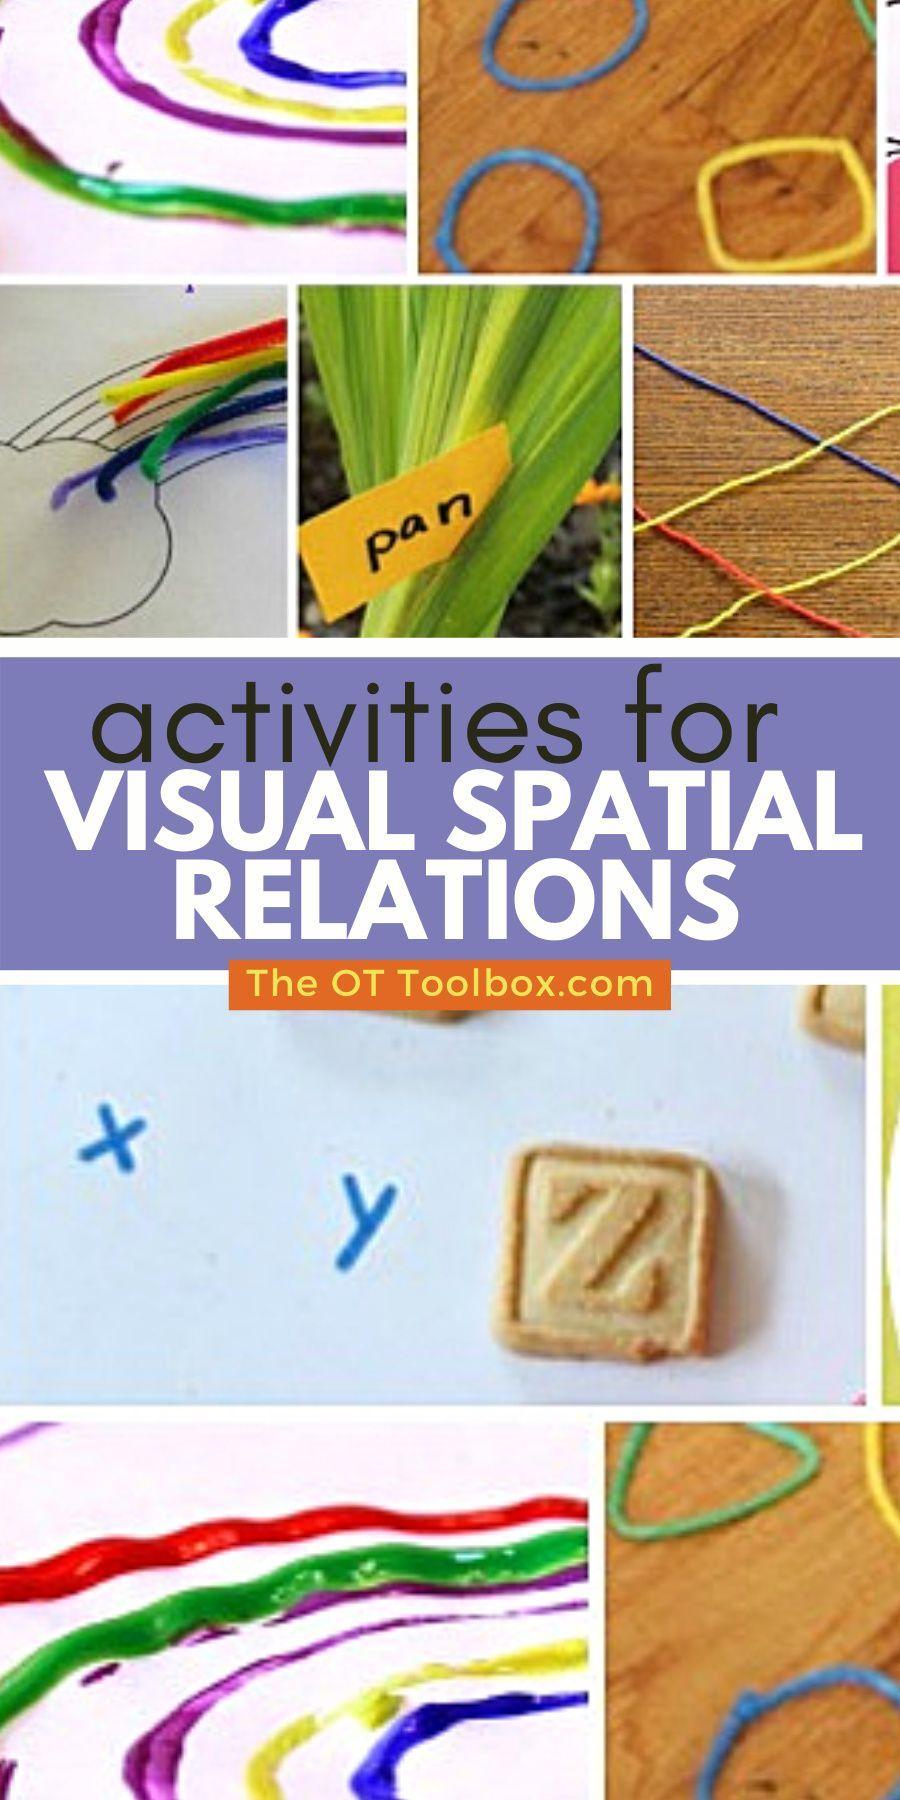 Visual Motor Skills The Ot Toolbox In 2021 Eye Hand Coordination Activities Coordination Activities Educational Crafts [ 1800 x 900 Pixel ]